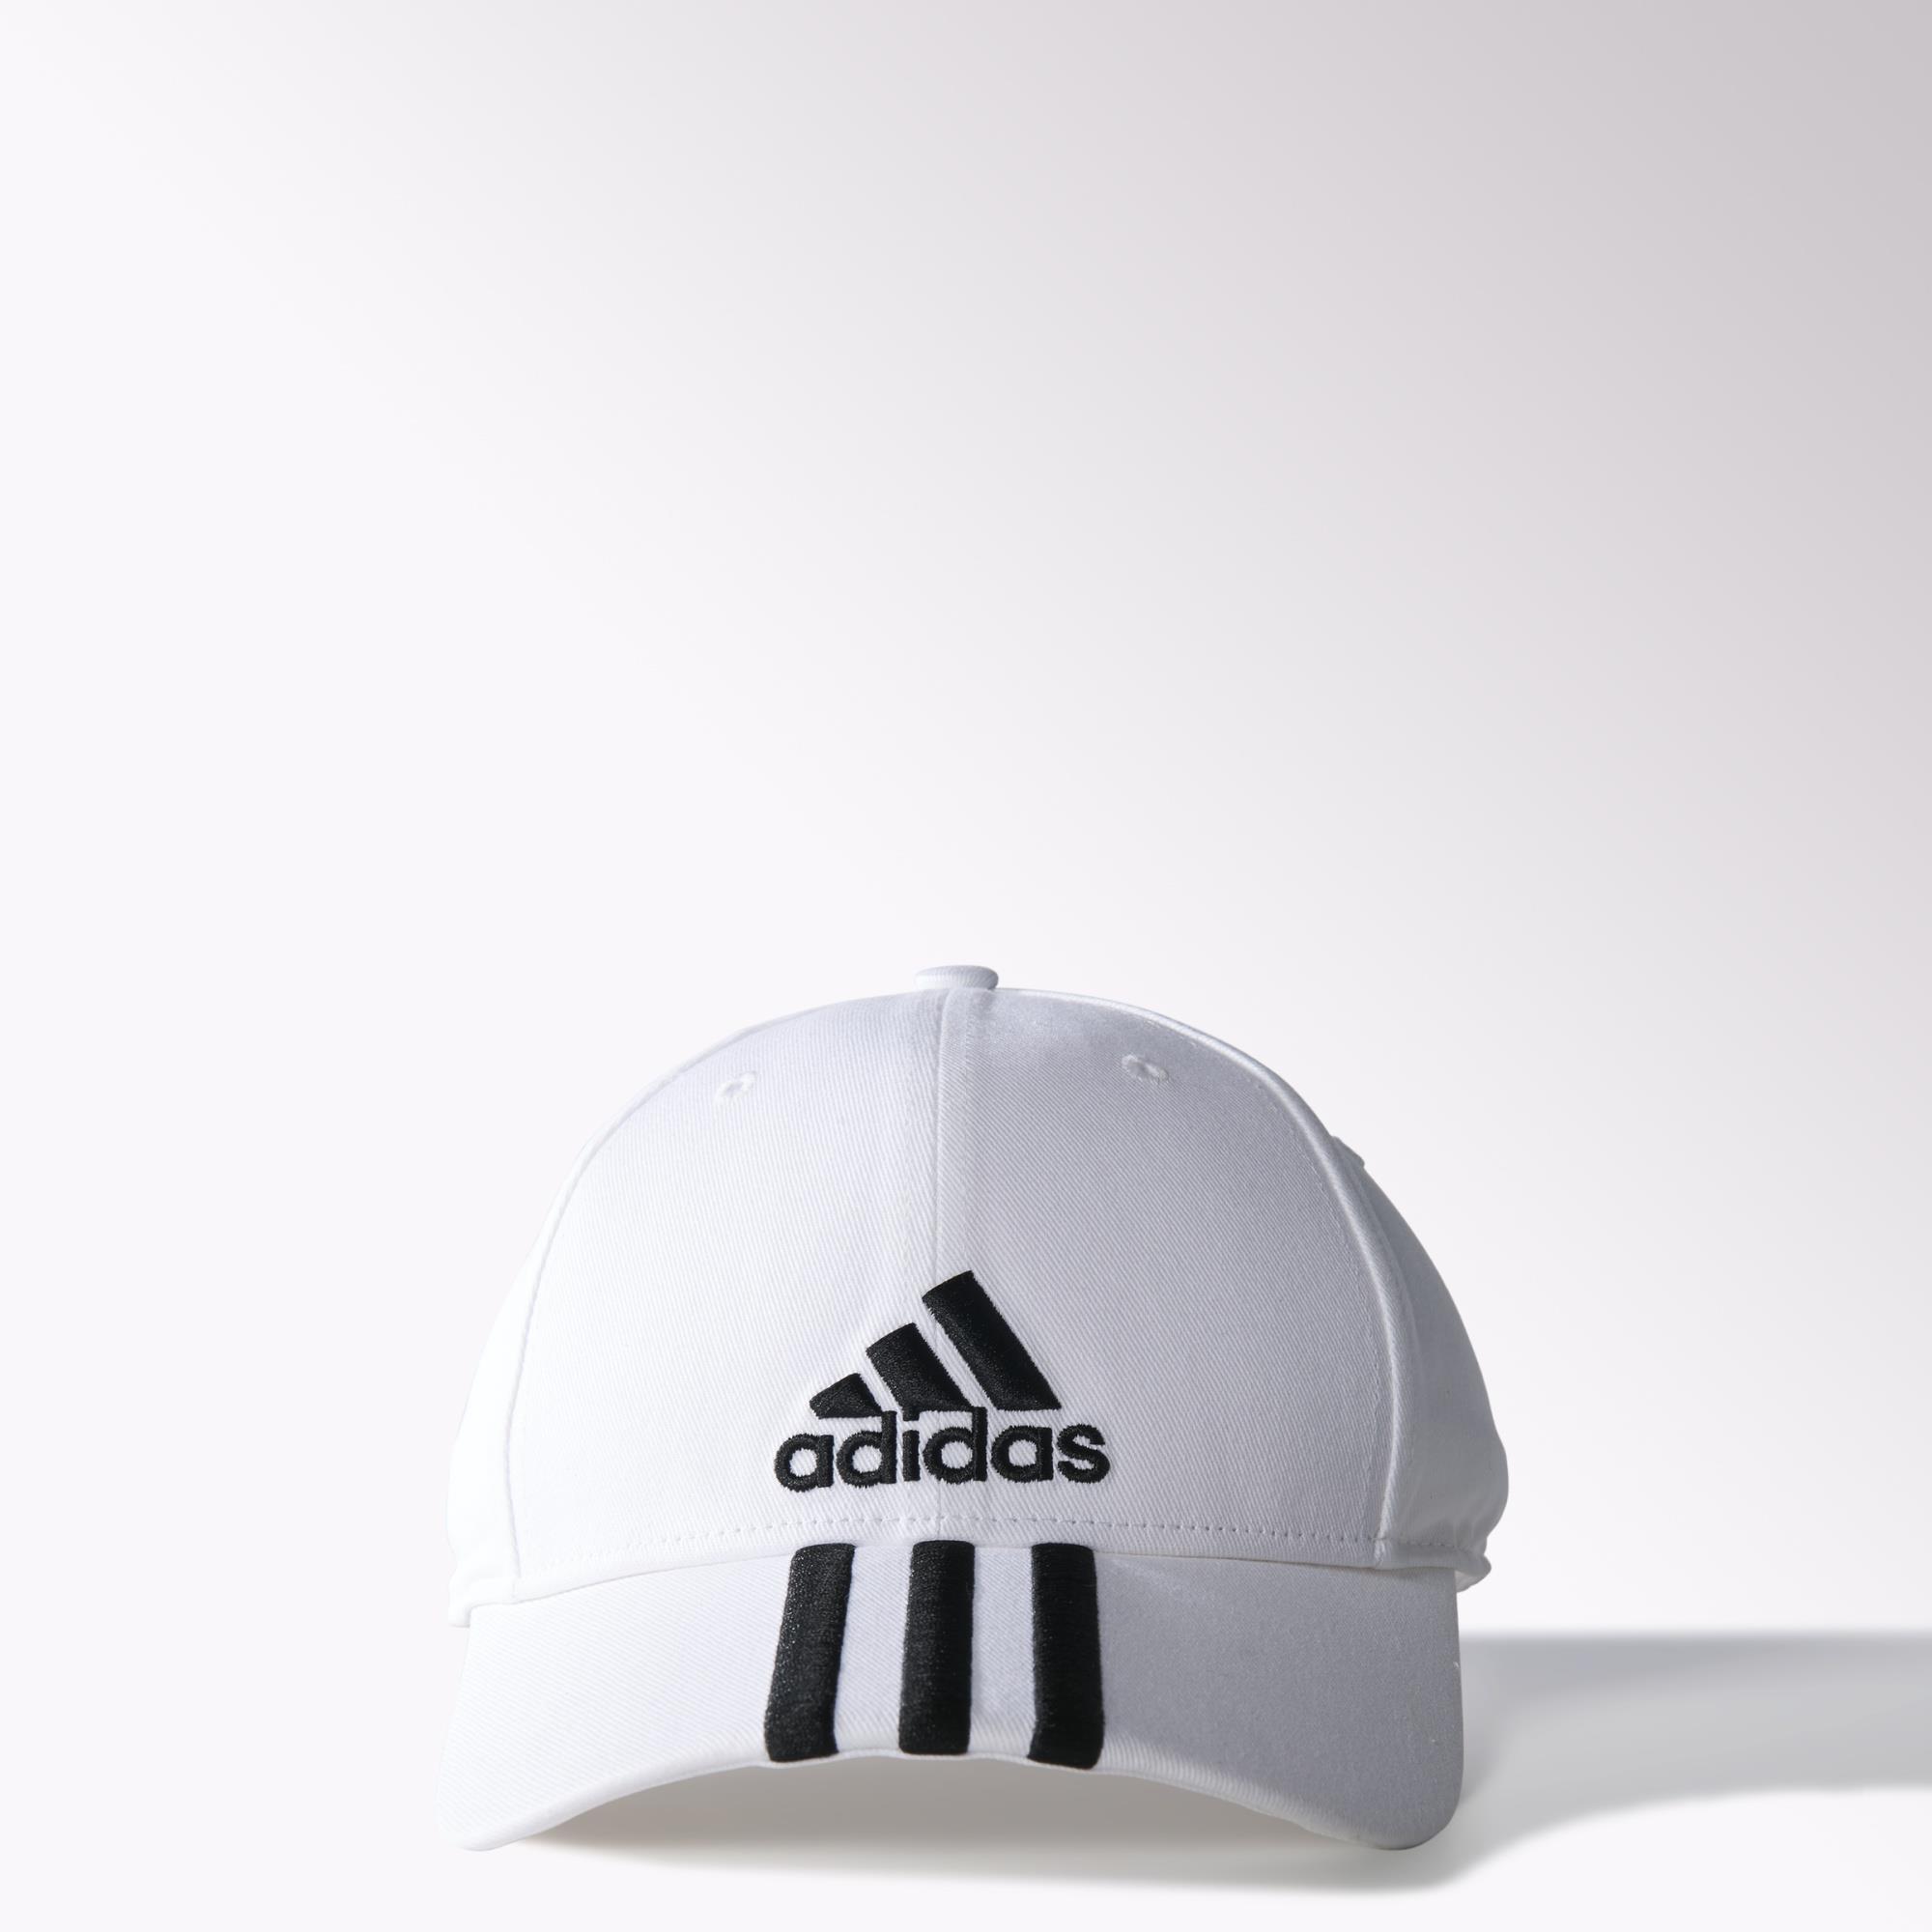 21107687ddda6 adidas Performance 3-Stripes Cap - White